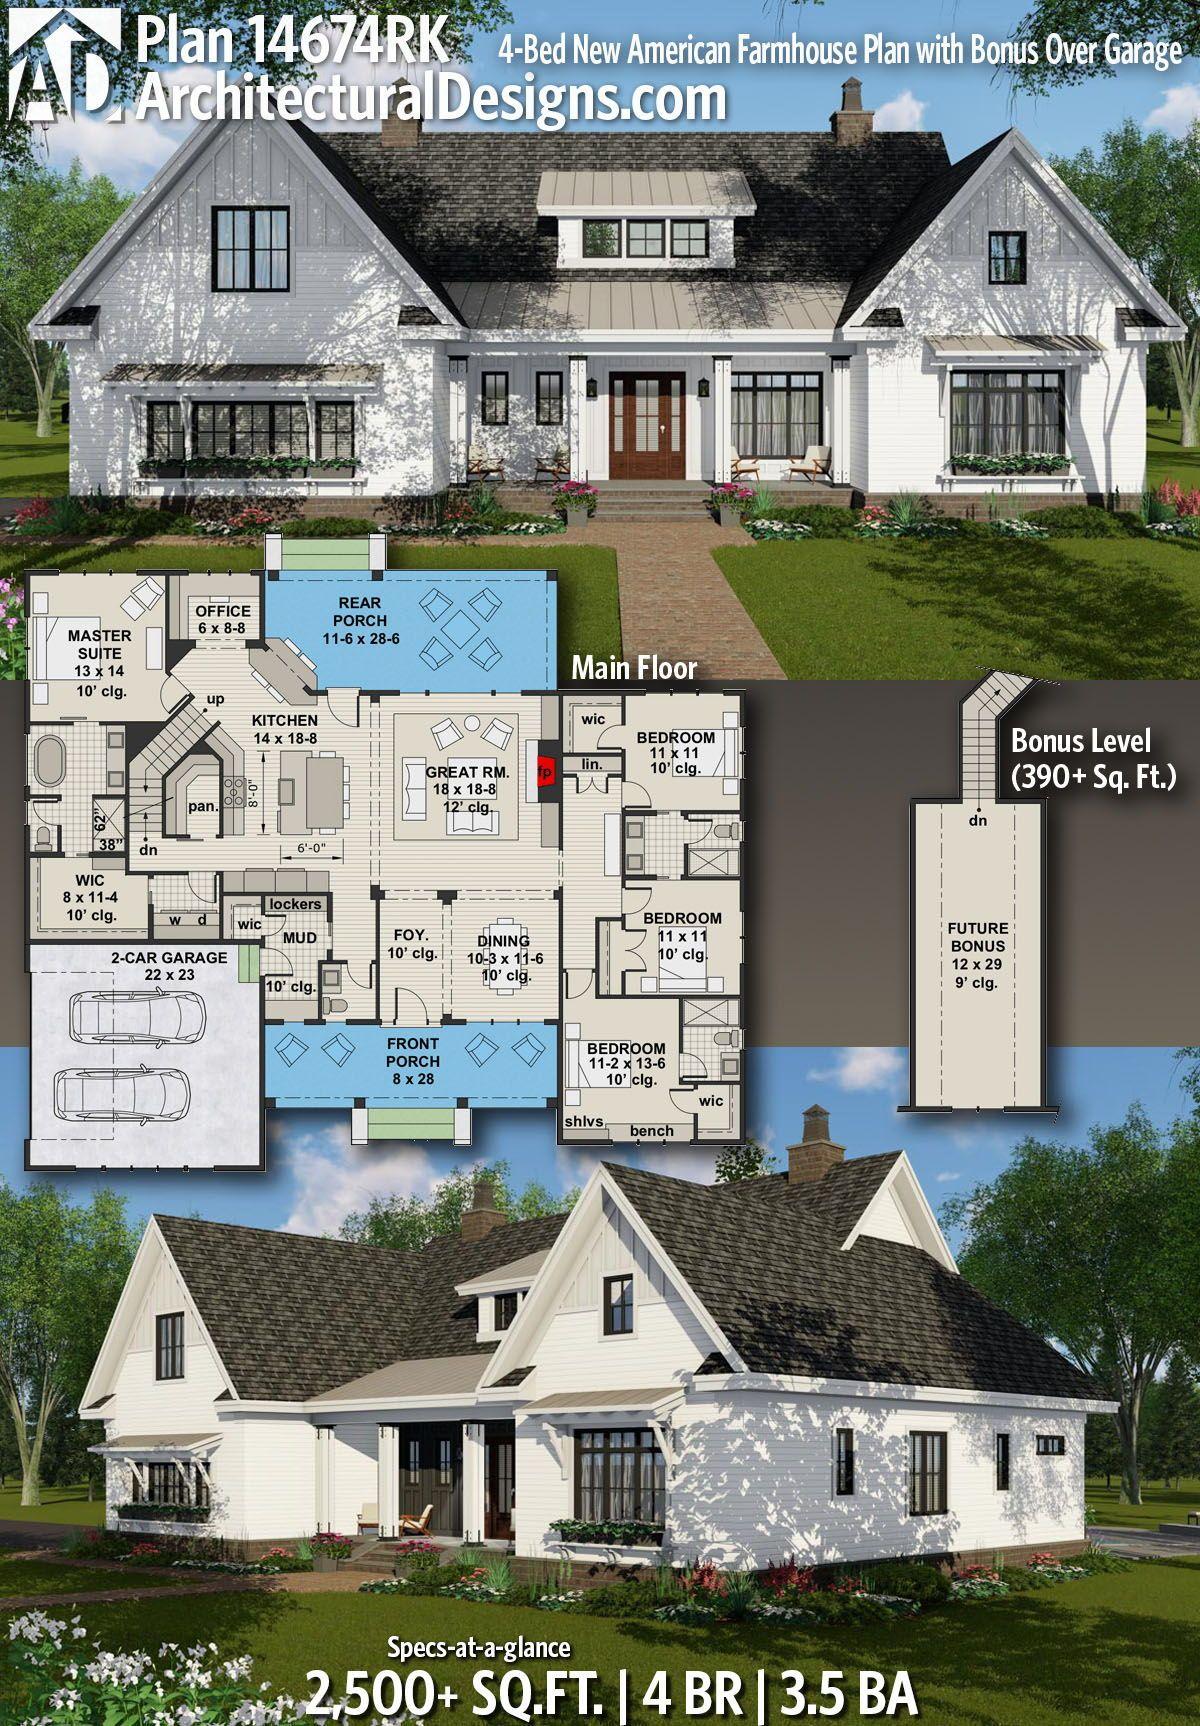 Plan 14674rk 4 Bed New American Farmhouse Plan With Bonus Over Garage House Plans Farmhouse Modern Farmhouse Plans Farmhouse Plans